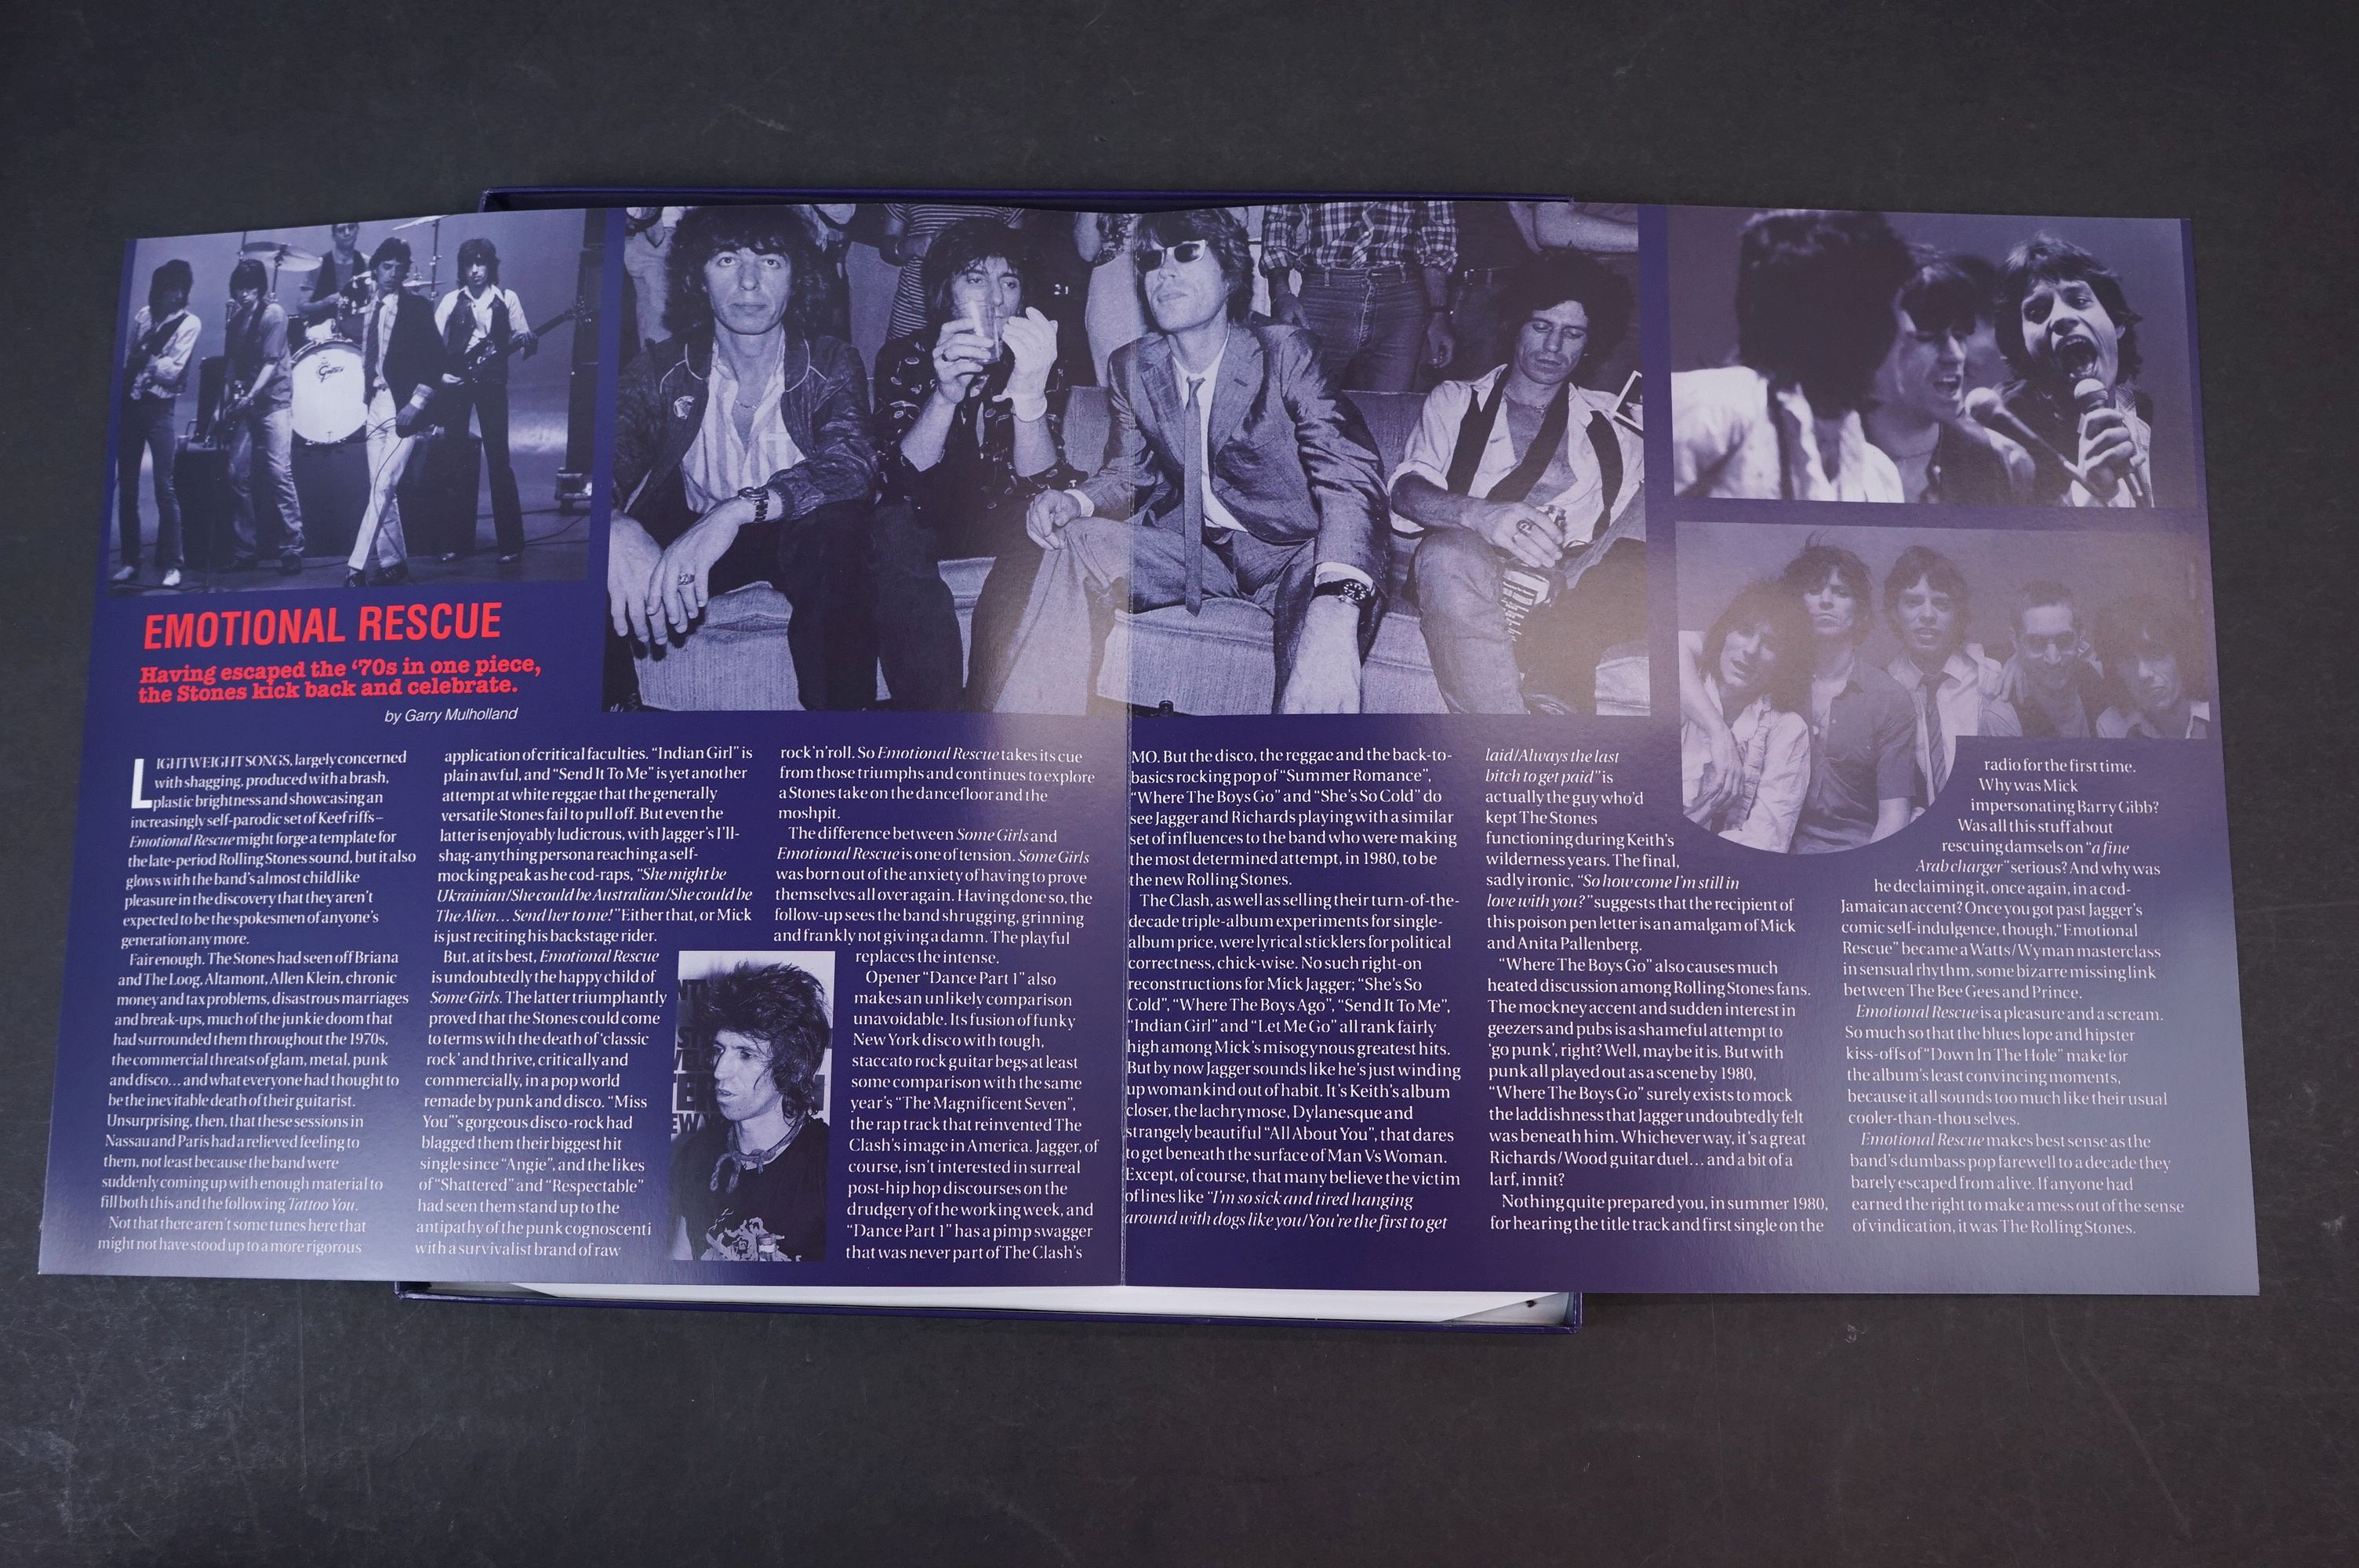 Vinyl - ltd edn The Real Alternate Album Rolling Stones Emotional Rescue 4 LP / 2 CD Box Set, - Image 4 of 12